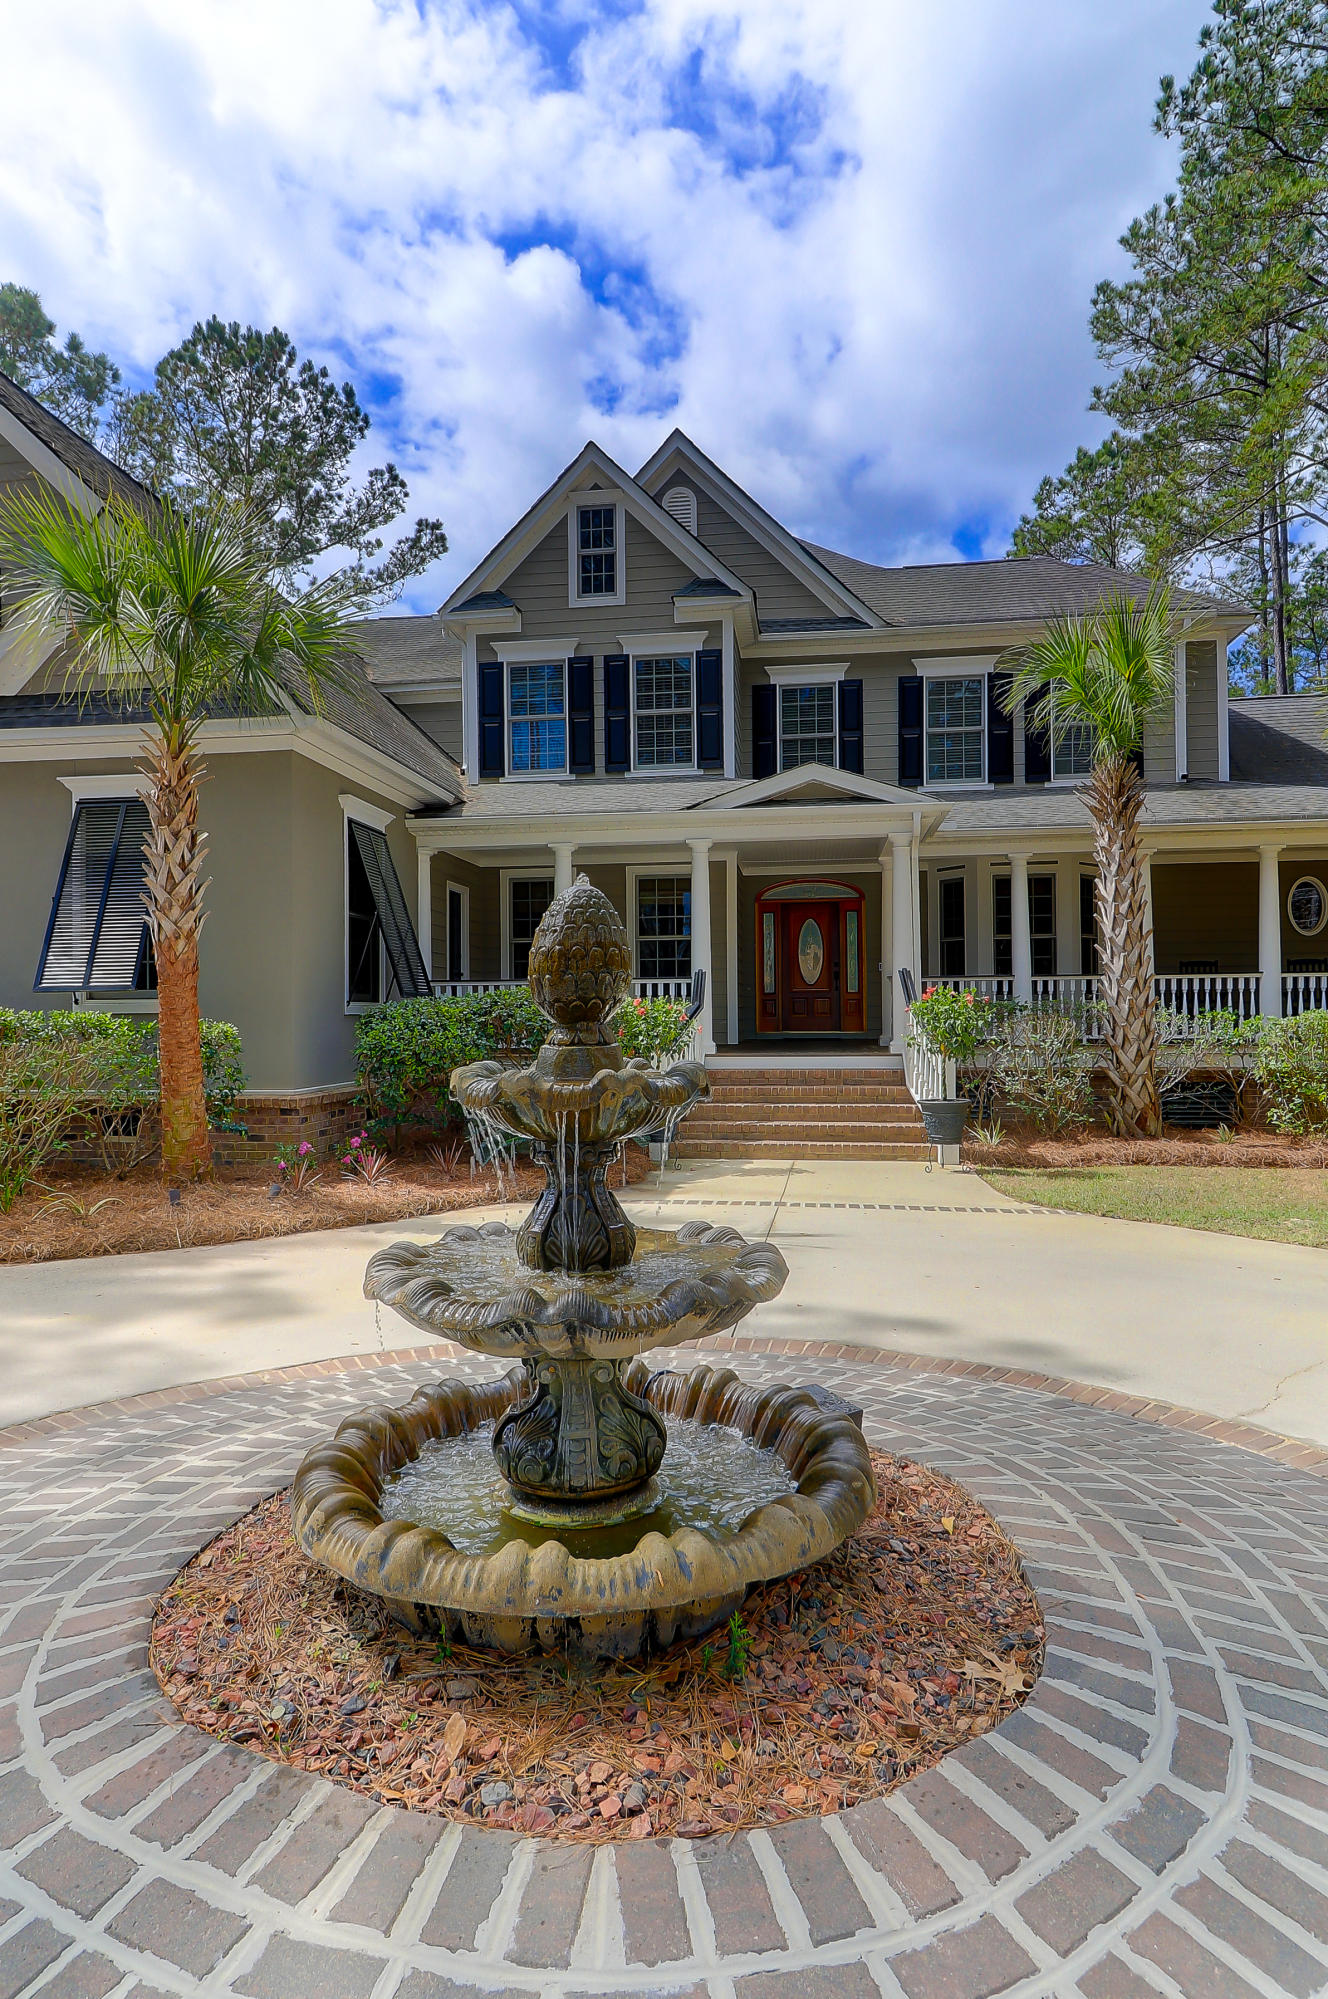 Dunes West Homes For Sale - 2996 Pignatelli Crescent, Mount Pleasant, SC - 1